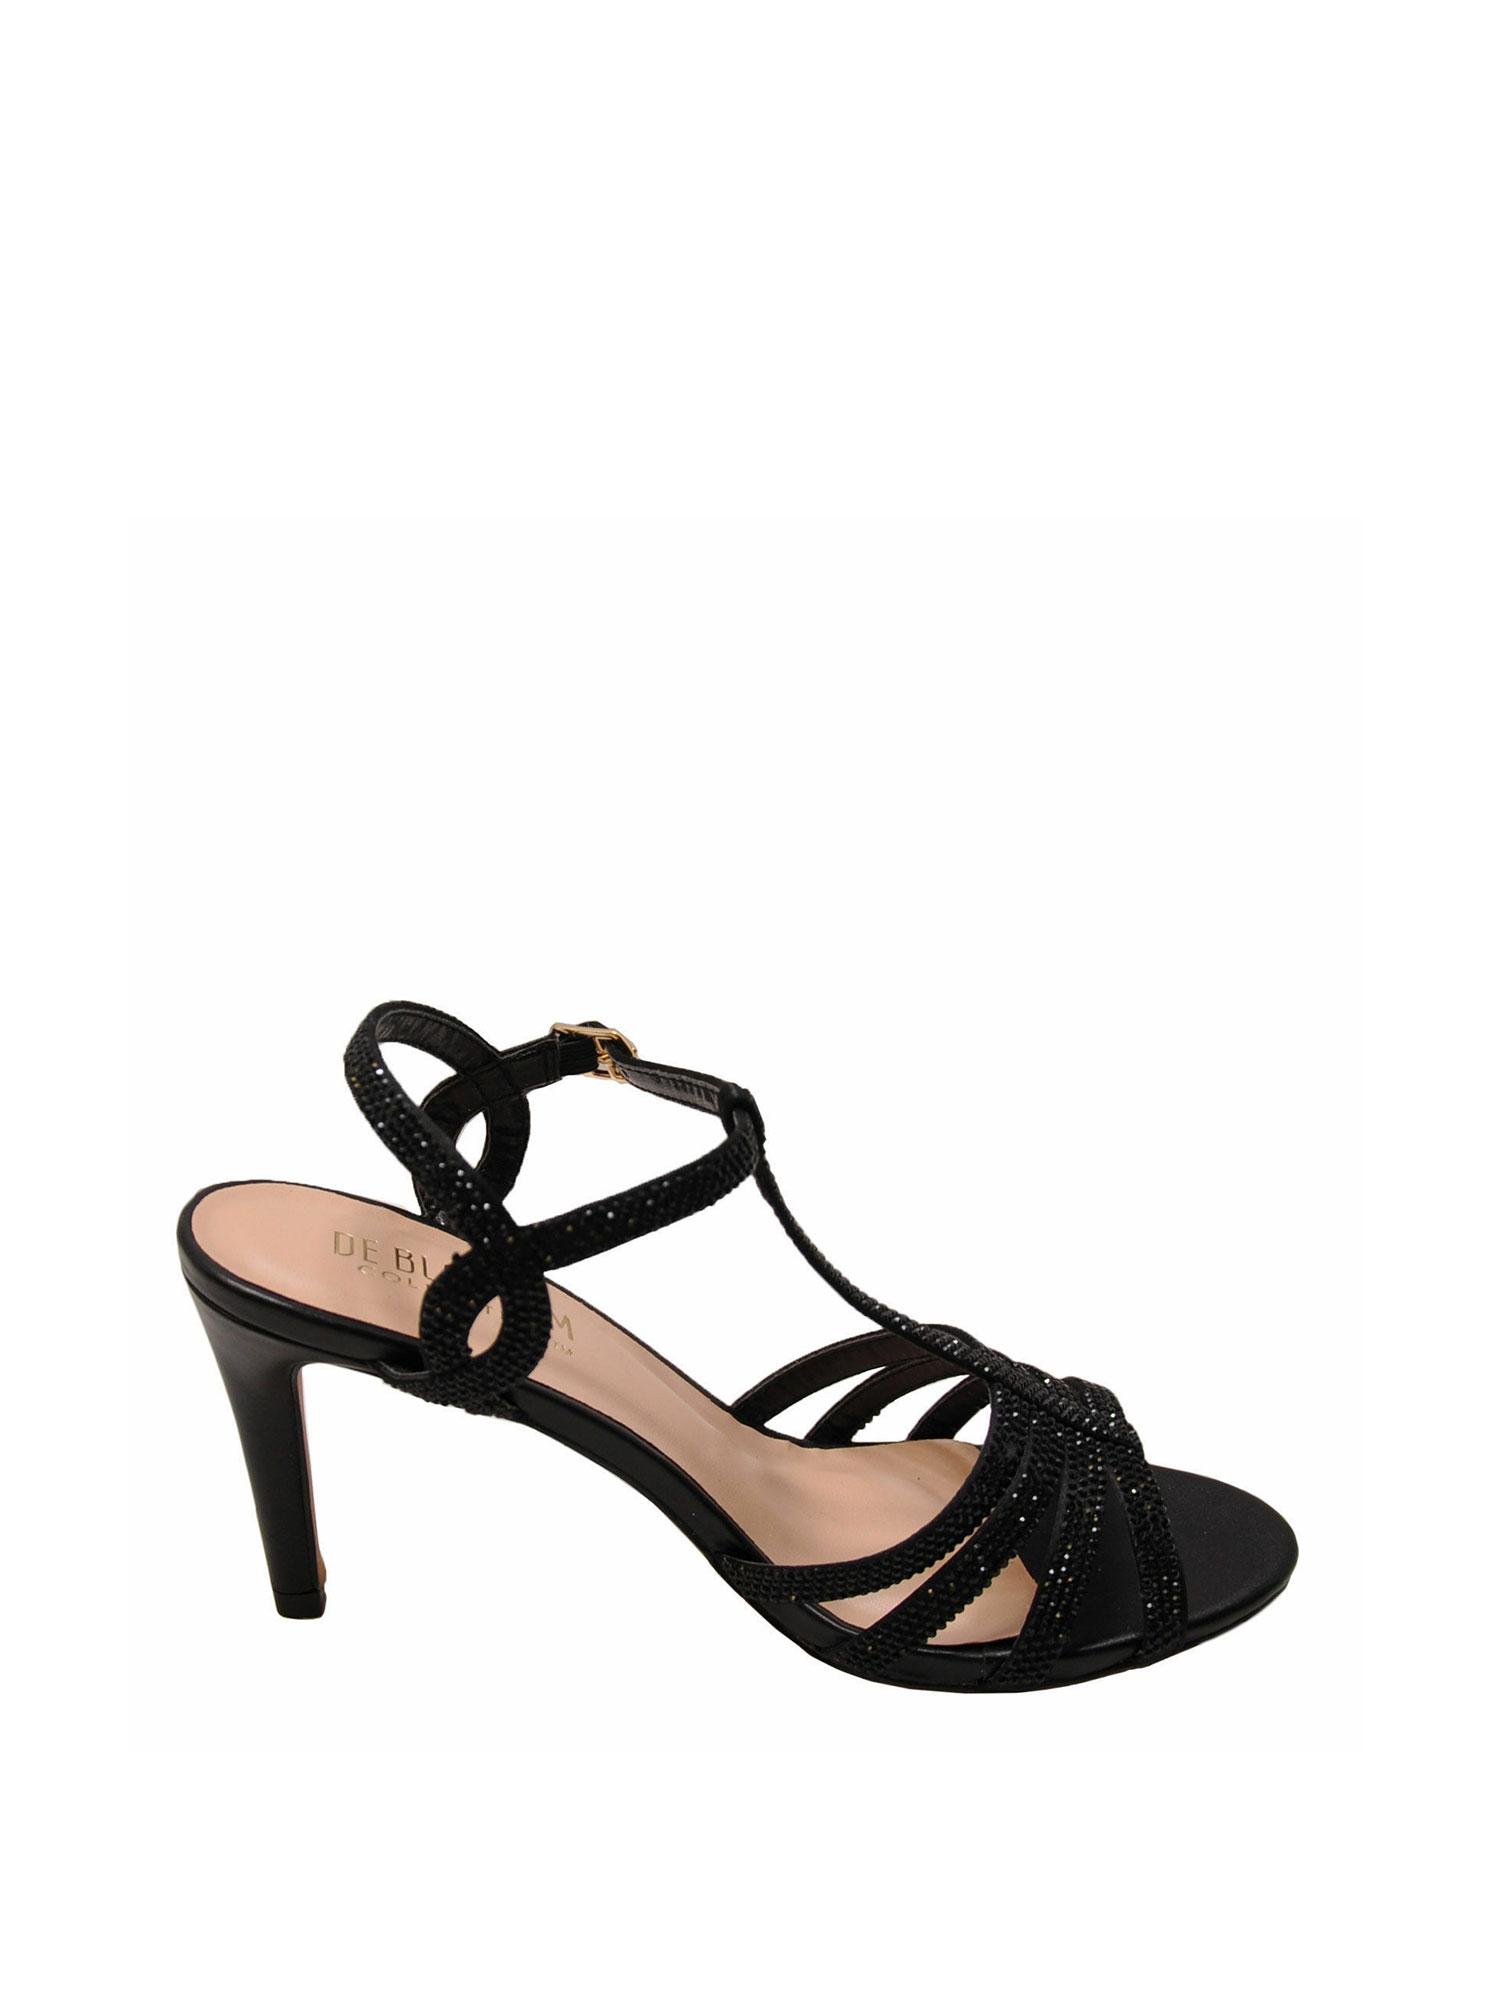 Blossom Rita 3X Ivory Women/'s T-Strap Embellished Formal Heels